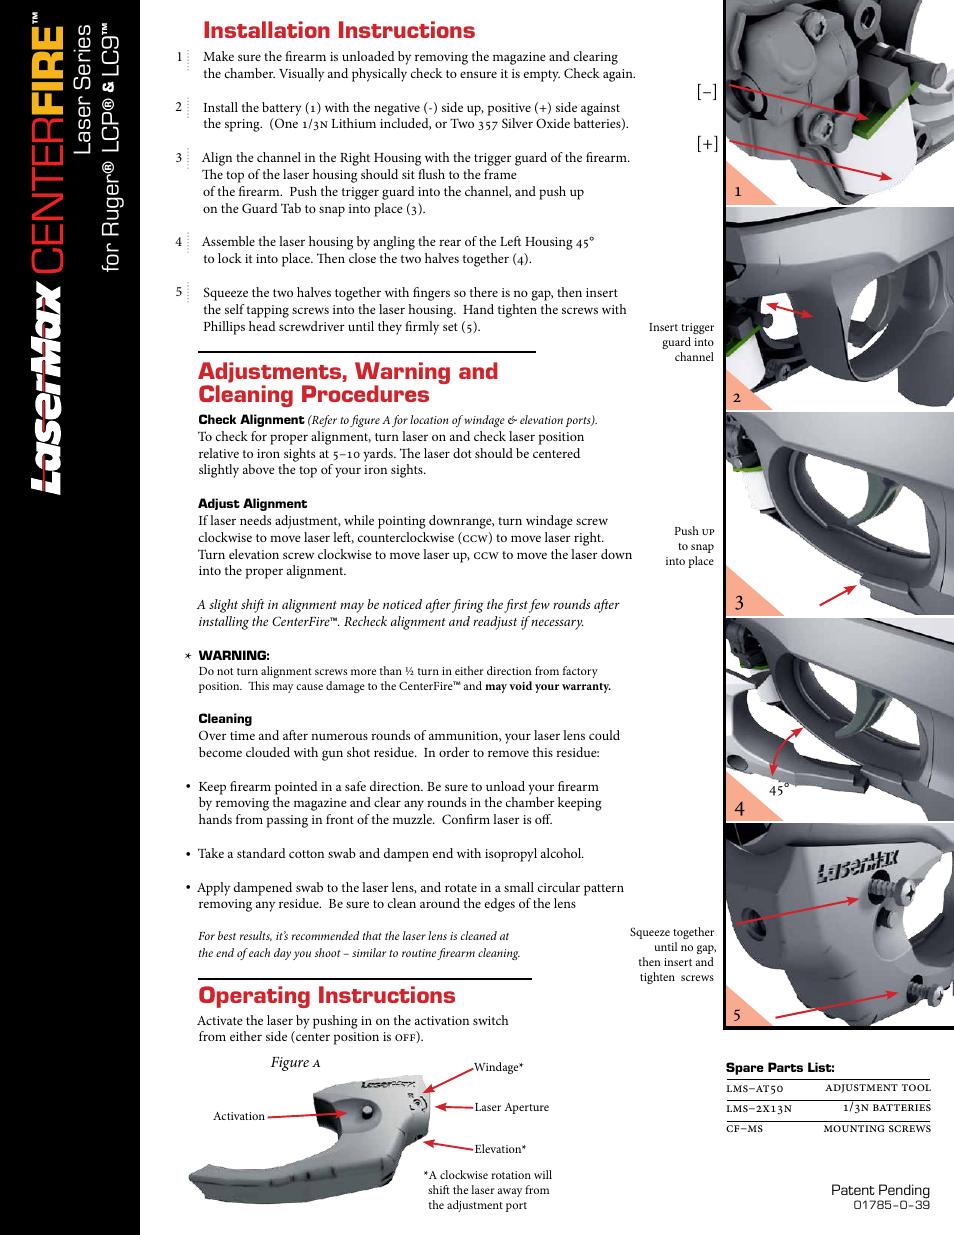 Lasermax glock guide rod installation for beretta pistols youtube.